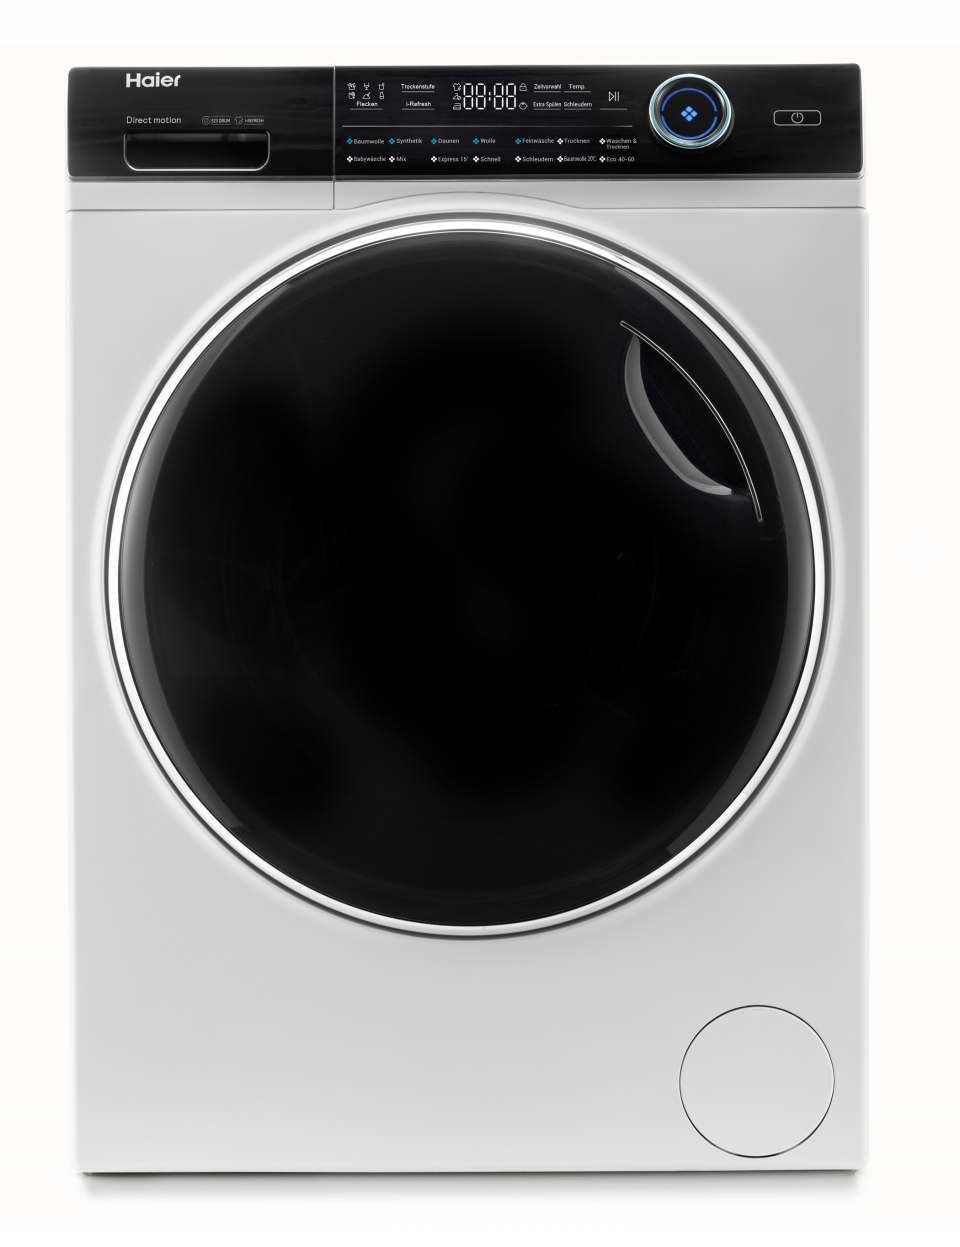 Haier Waschtrockner I-Pro 7 mit I-Refresh.